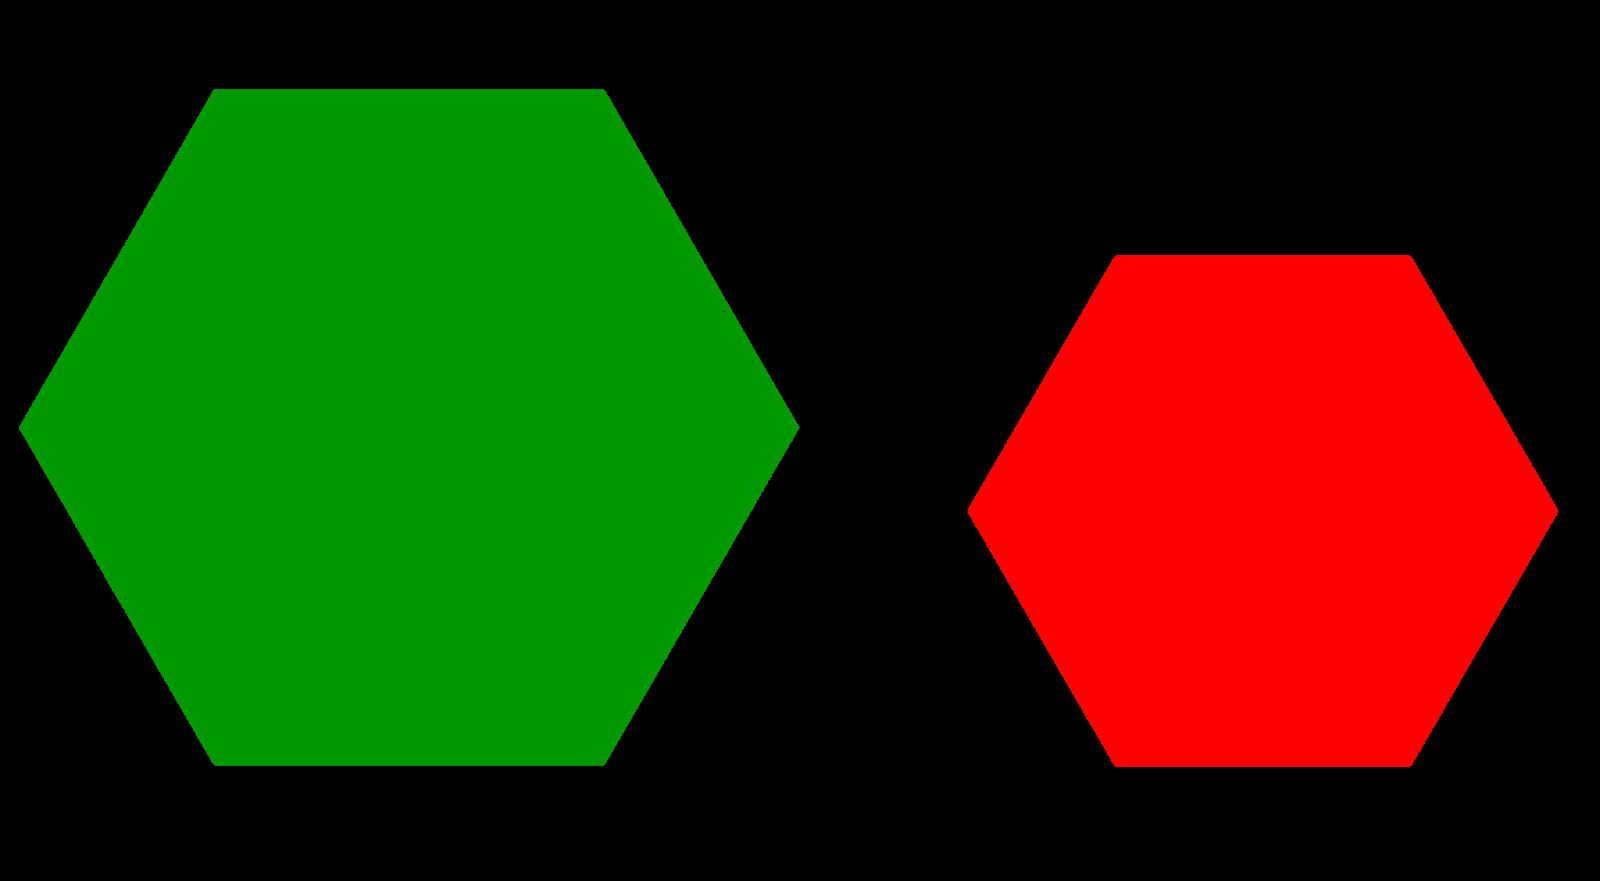 Dous hexágonos regulares